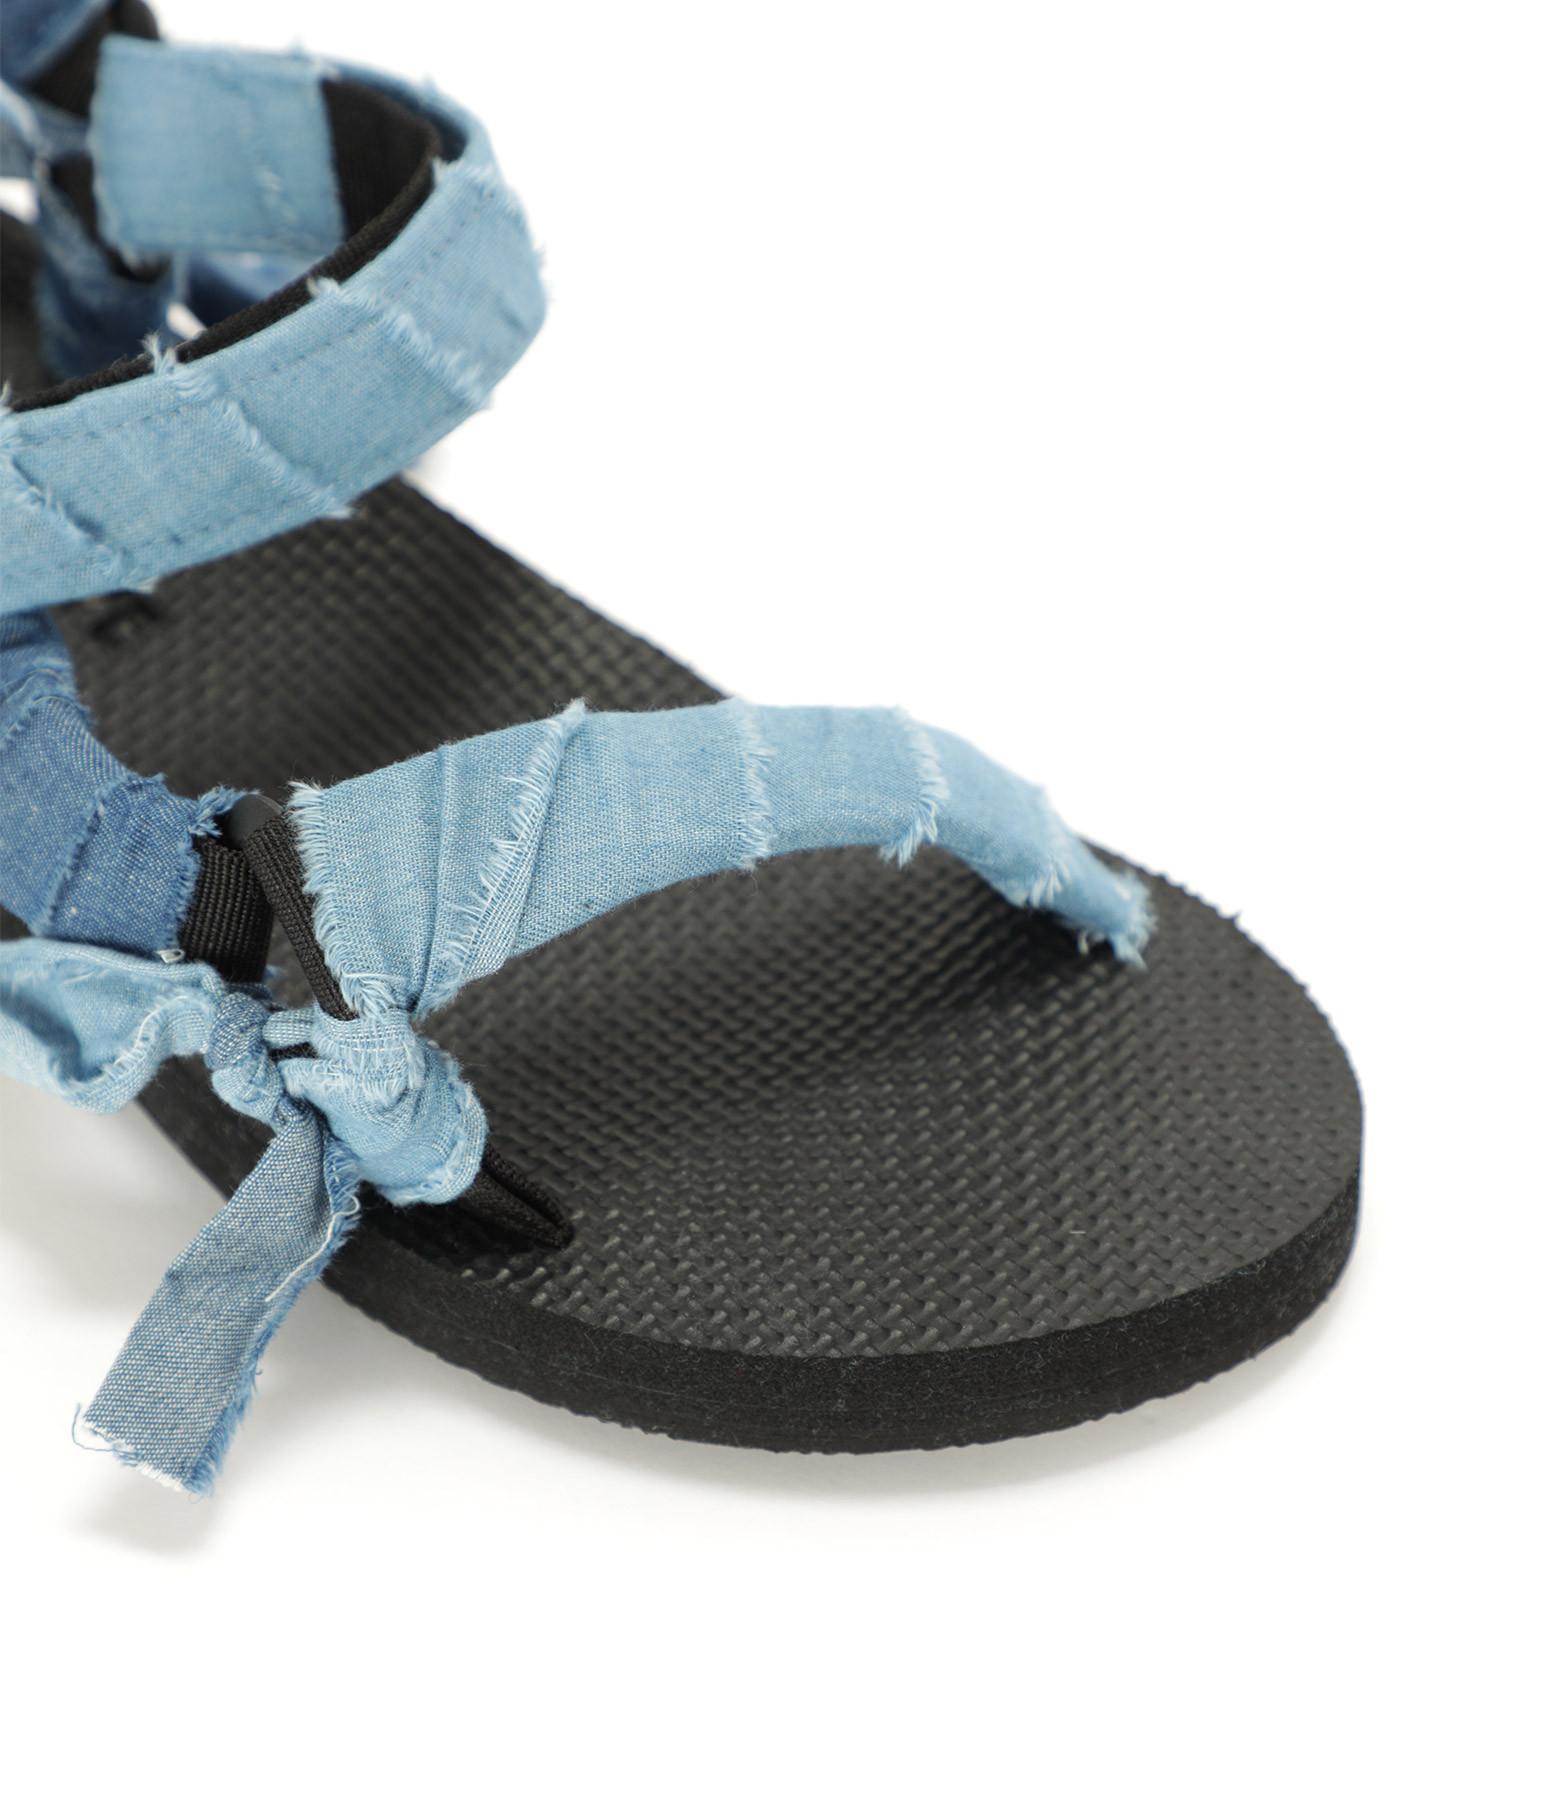 ARIZONA LOVE - Sandales Trekky Denim Bleu